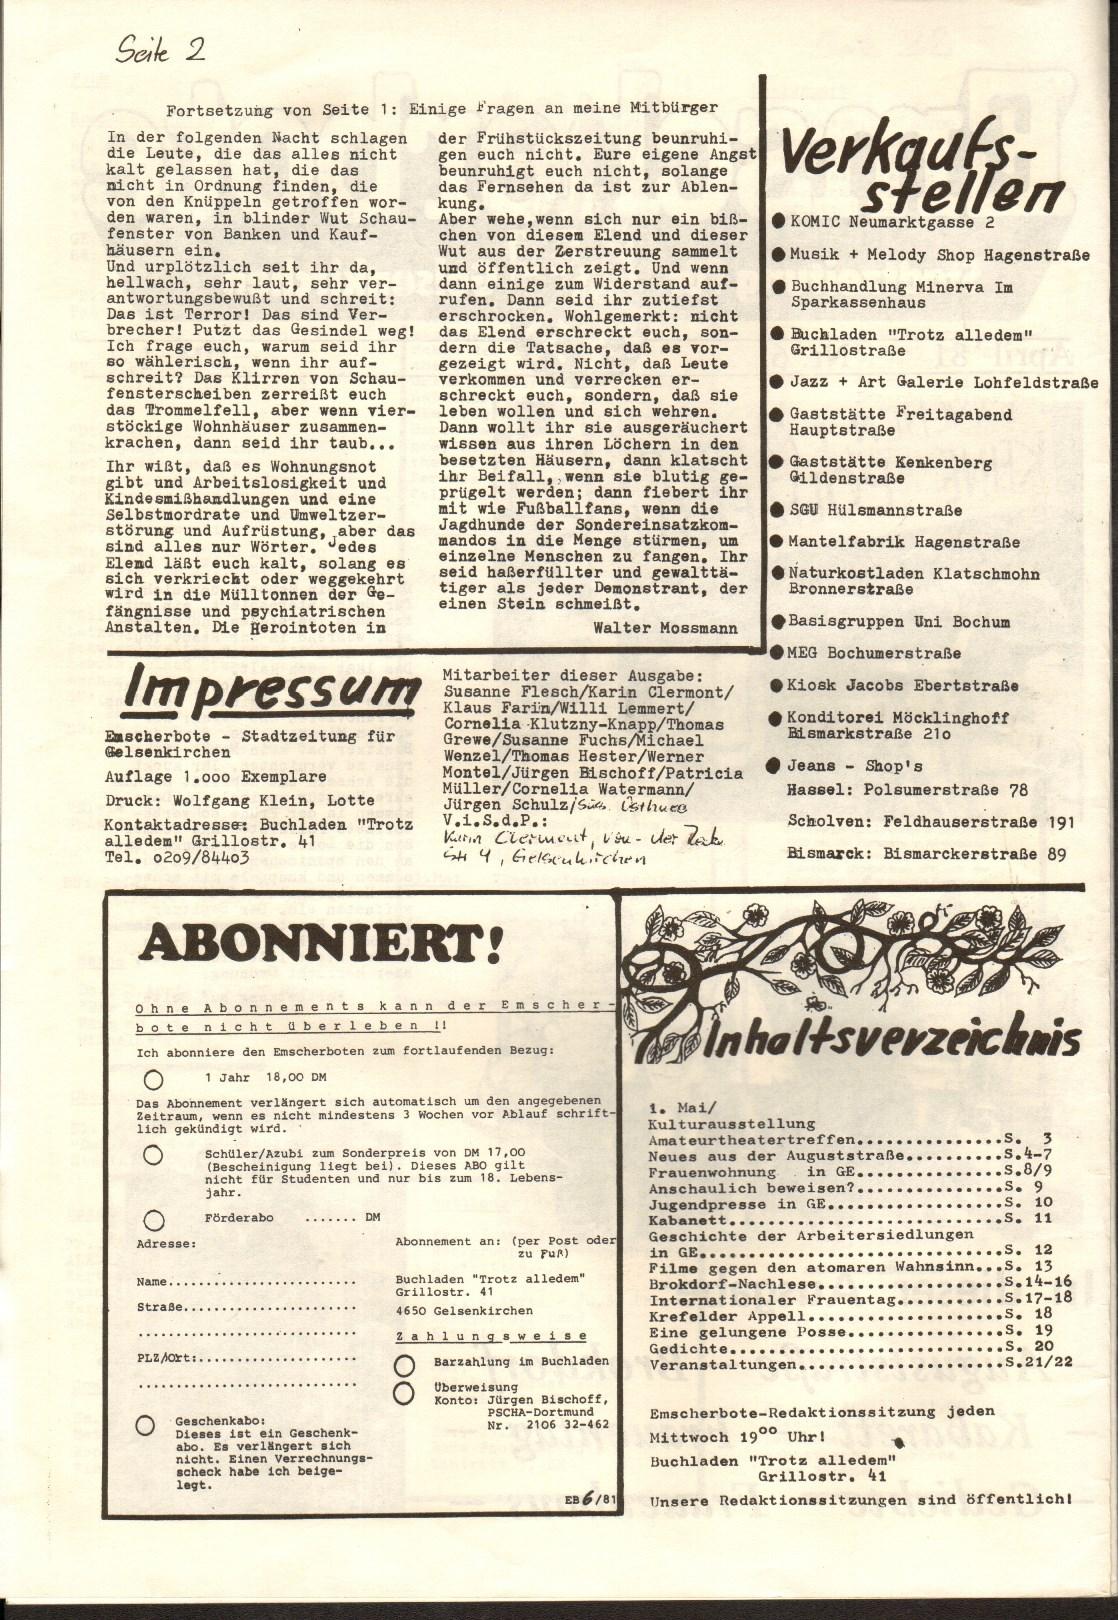 Gelsenkirchen_Emscherbote_1981_06_02